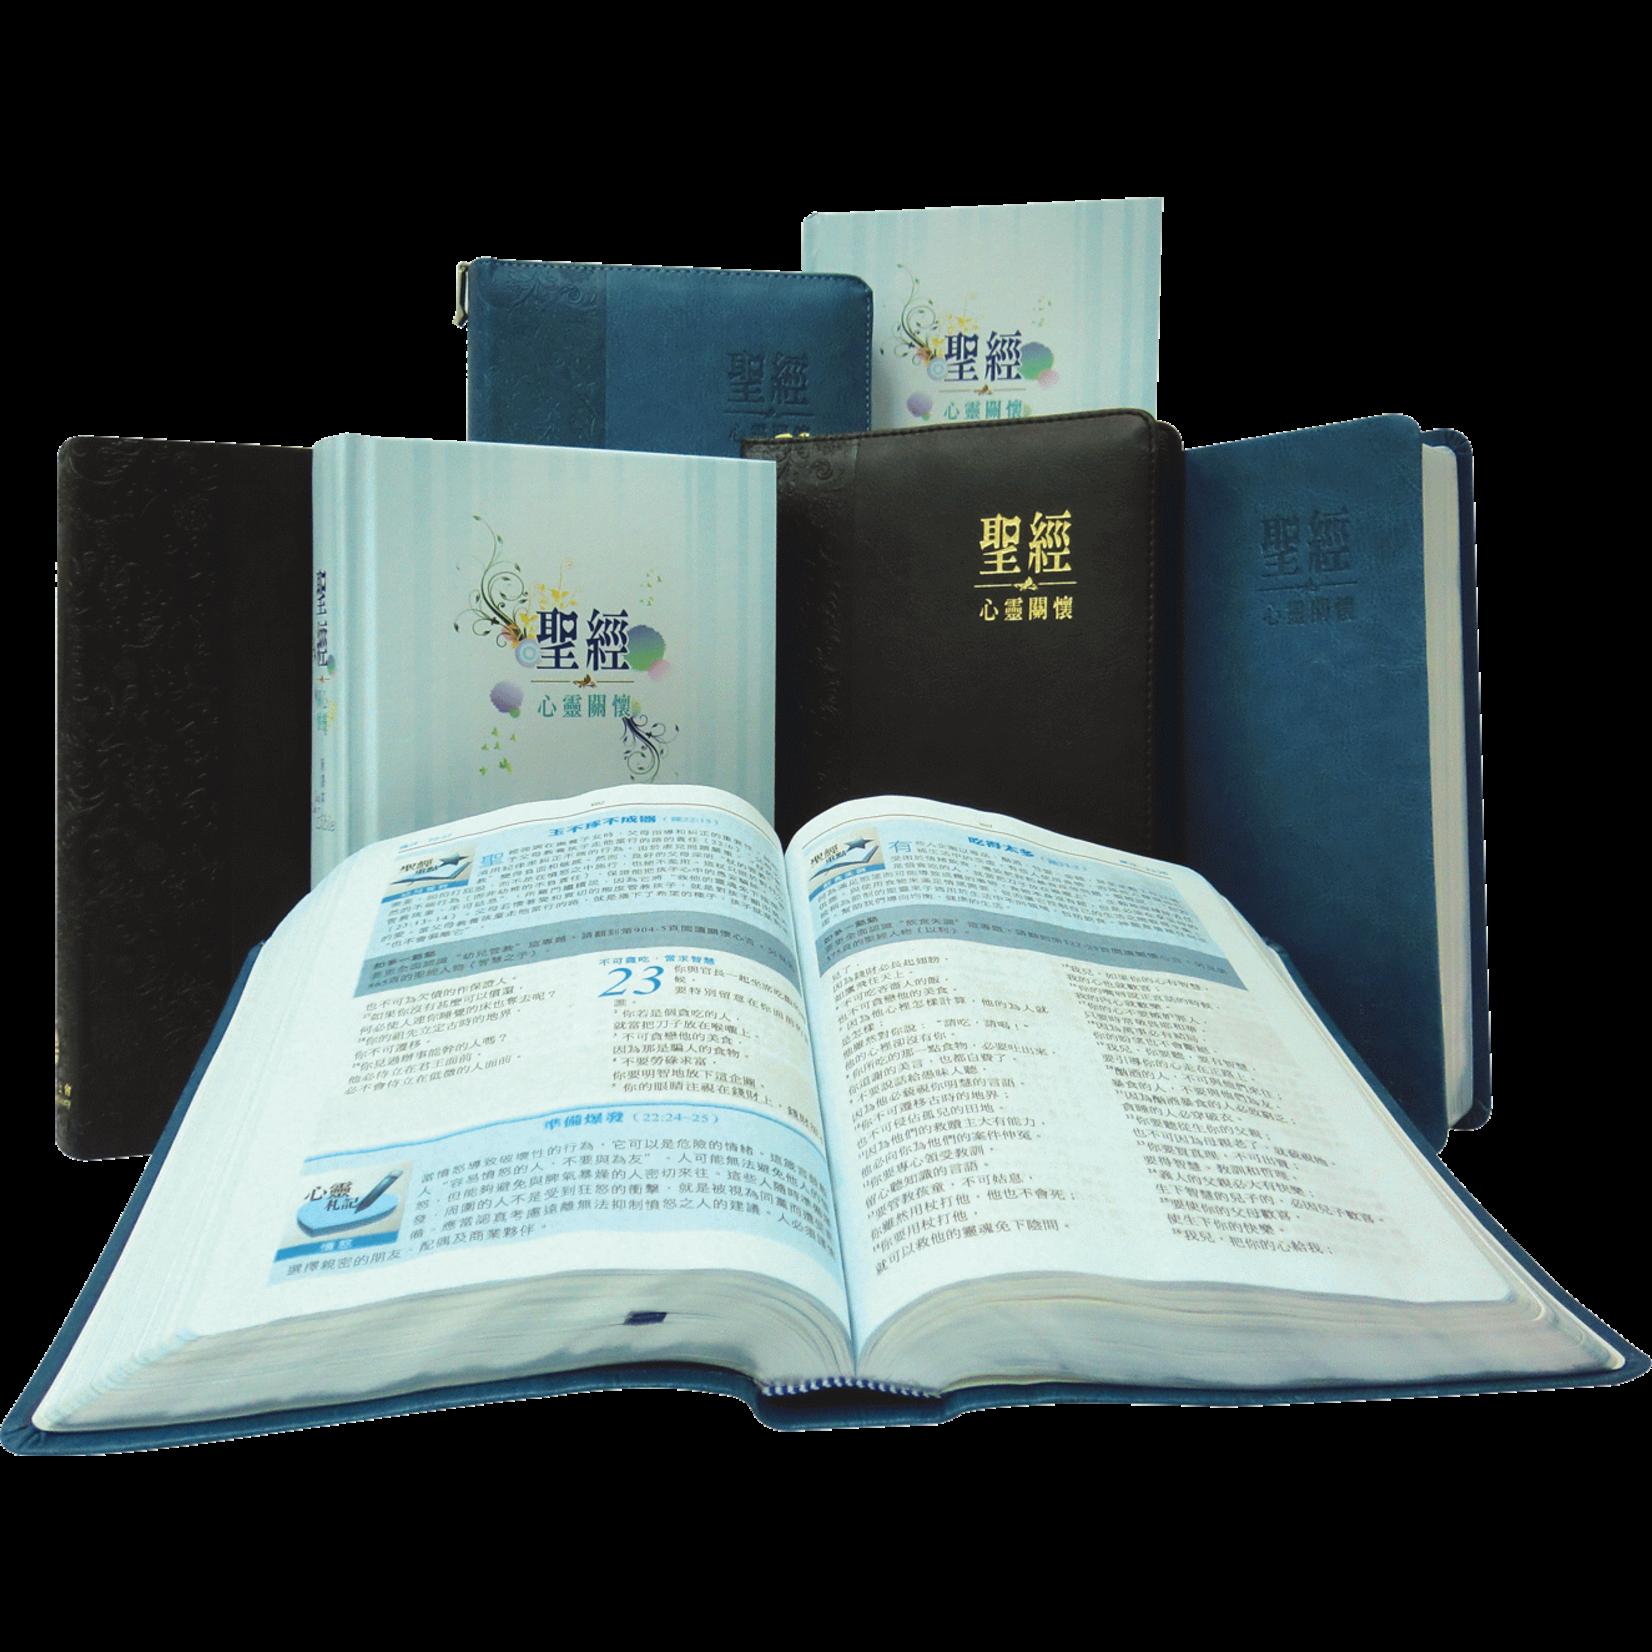 環球聖經公會 The Worldwide Bible Society 心靈關懷聖經・新譯本・彩色精裝白邊・繁體 CNV Soul Care Bible Trad., Standard, Color Hardback Cover , White Edge